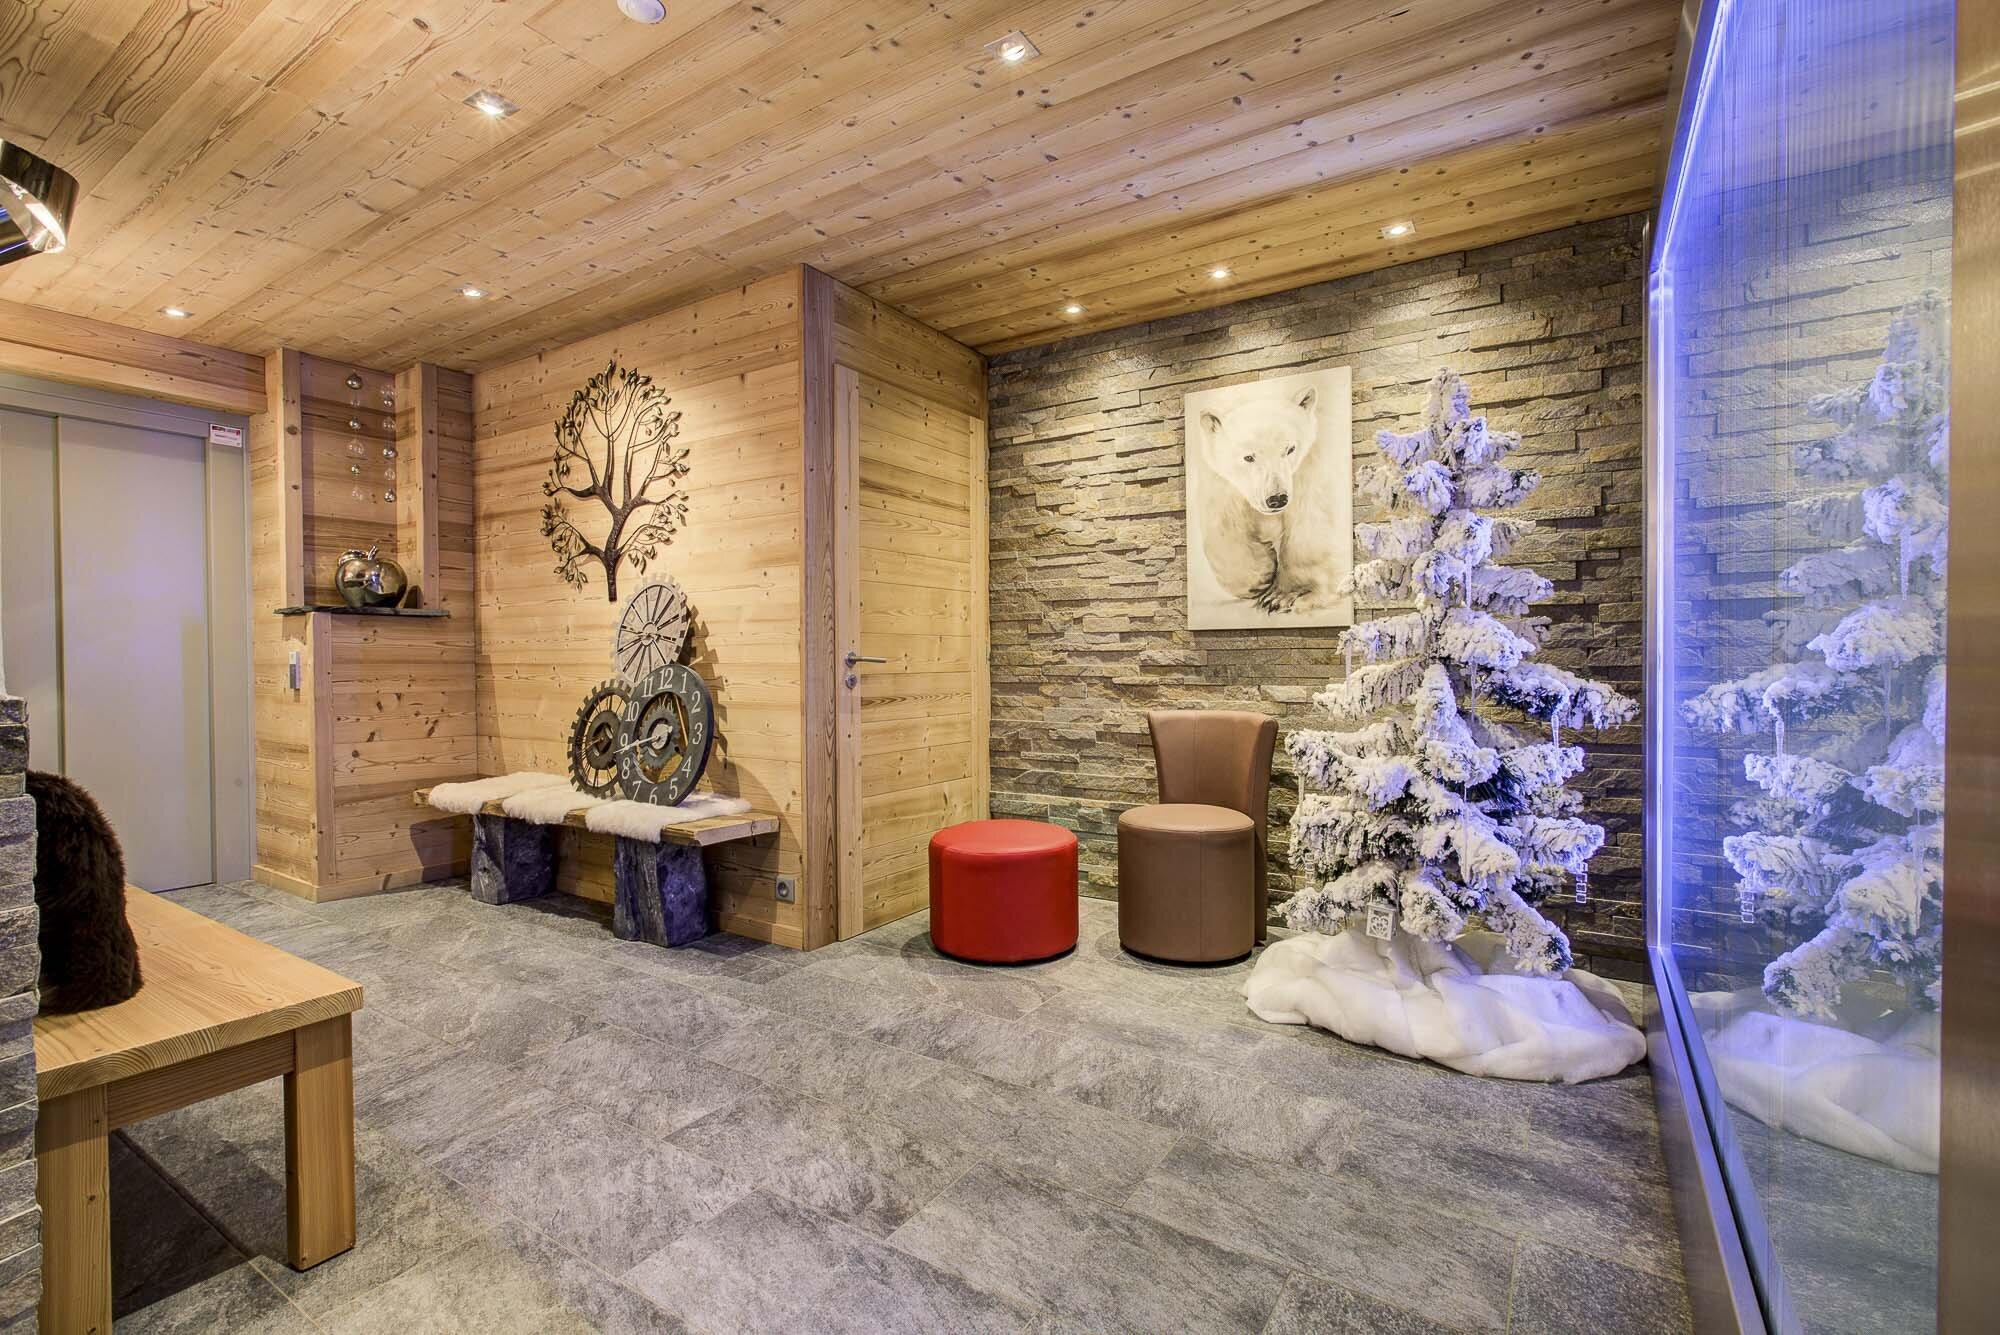 tg-ski-luxury-chalet-les-pierrys-morzine-020.jpg